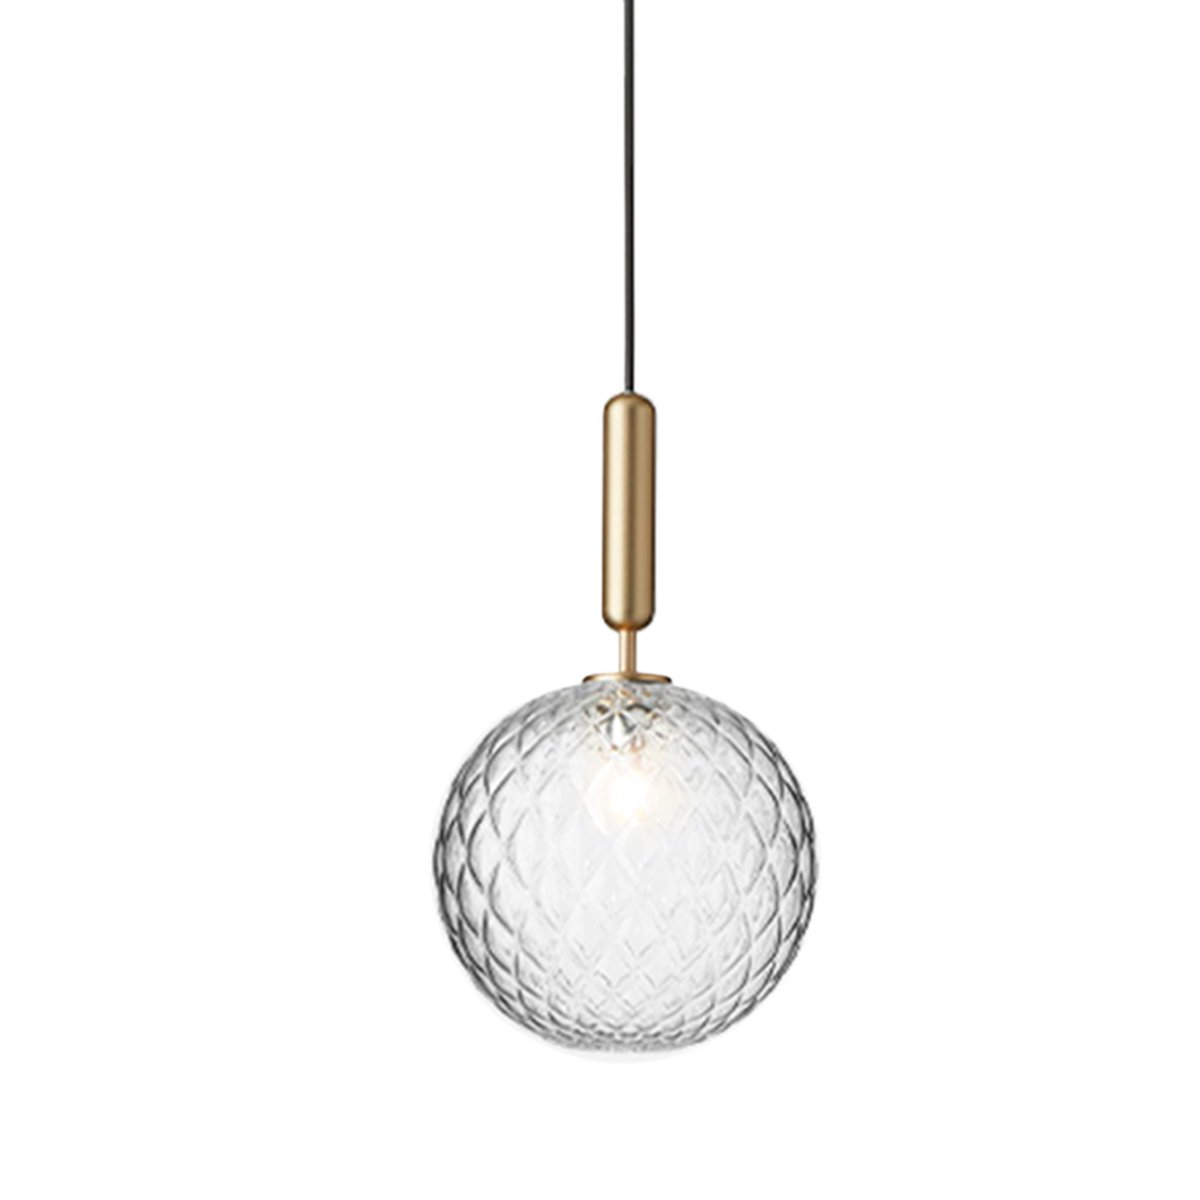 Nuura Miira 1 Hanglamp Large - Brass - Optic Clear